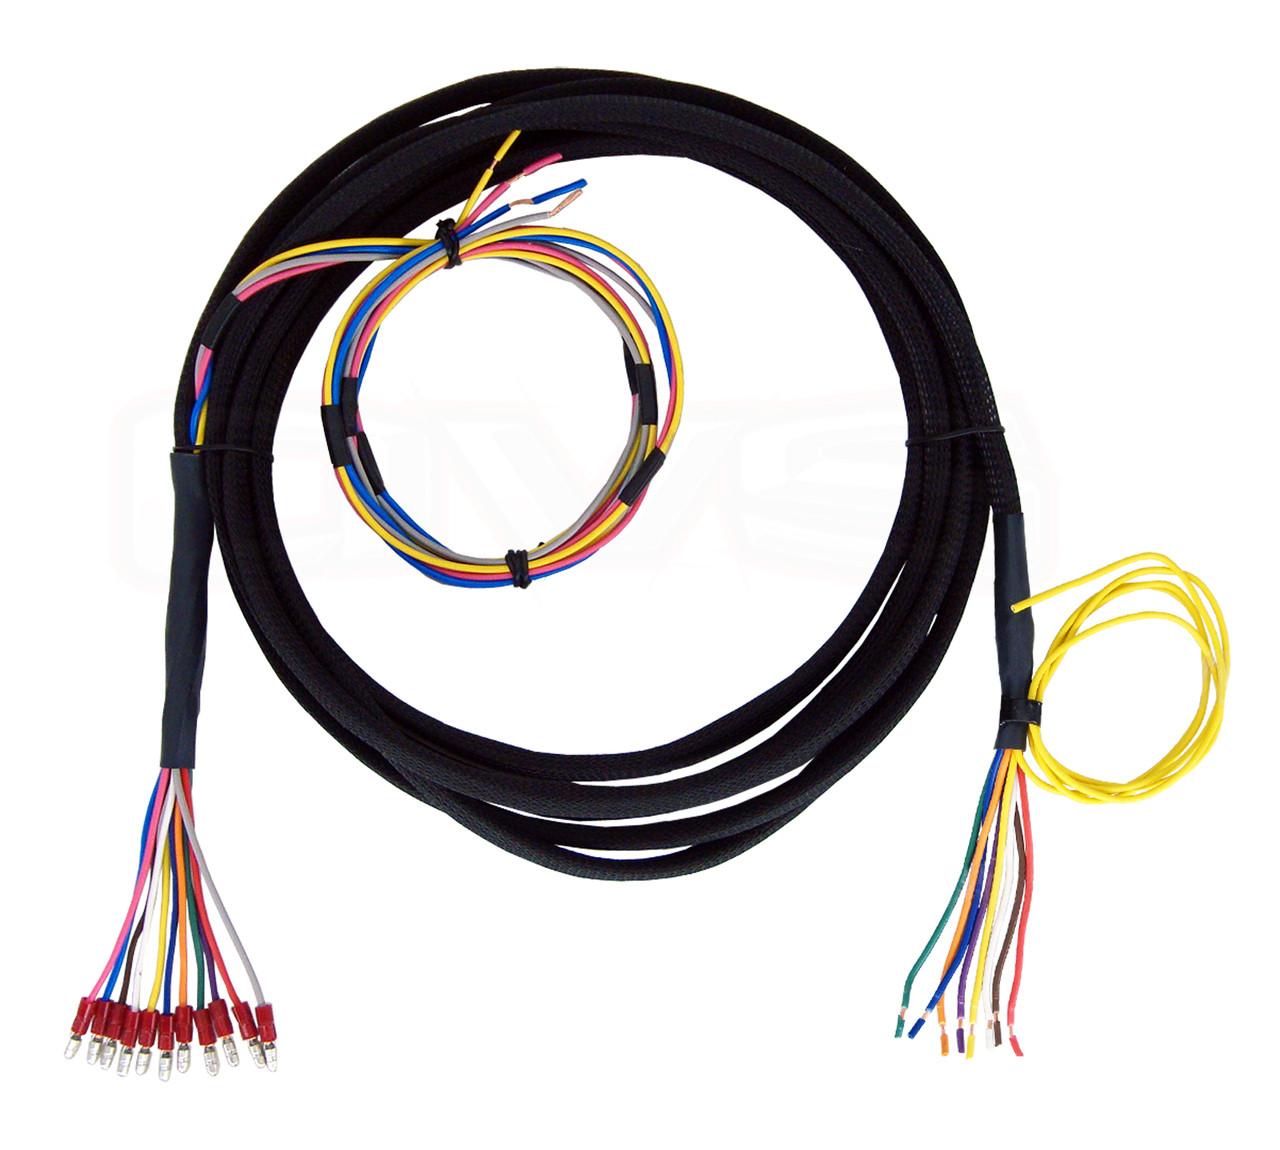 small resolution of avs valve wiring harness 10 15 20 universal to avs 7 switch rh avsontheweb com 7 wire trailer wiring harness 4 plug wiring harness diagram